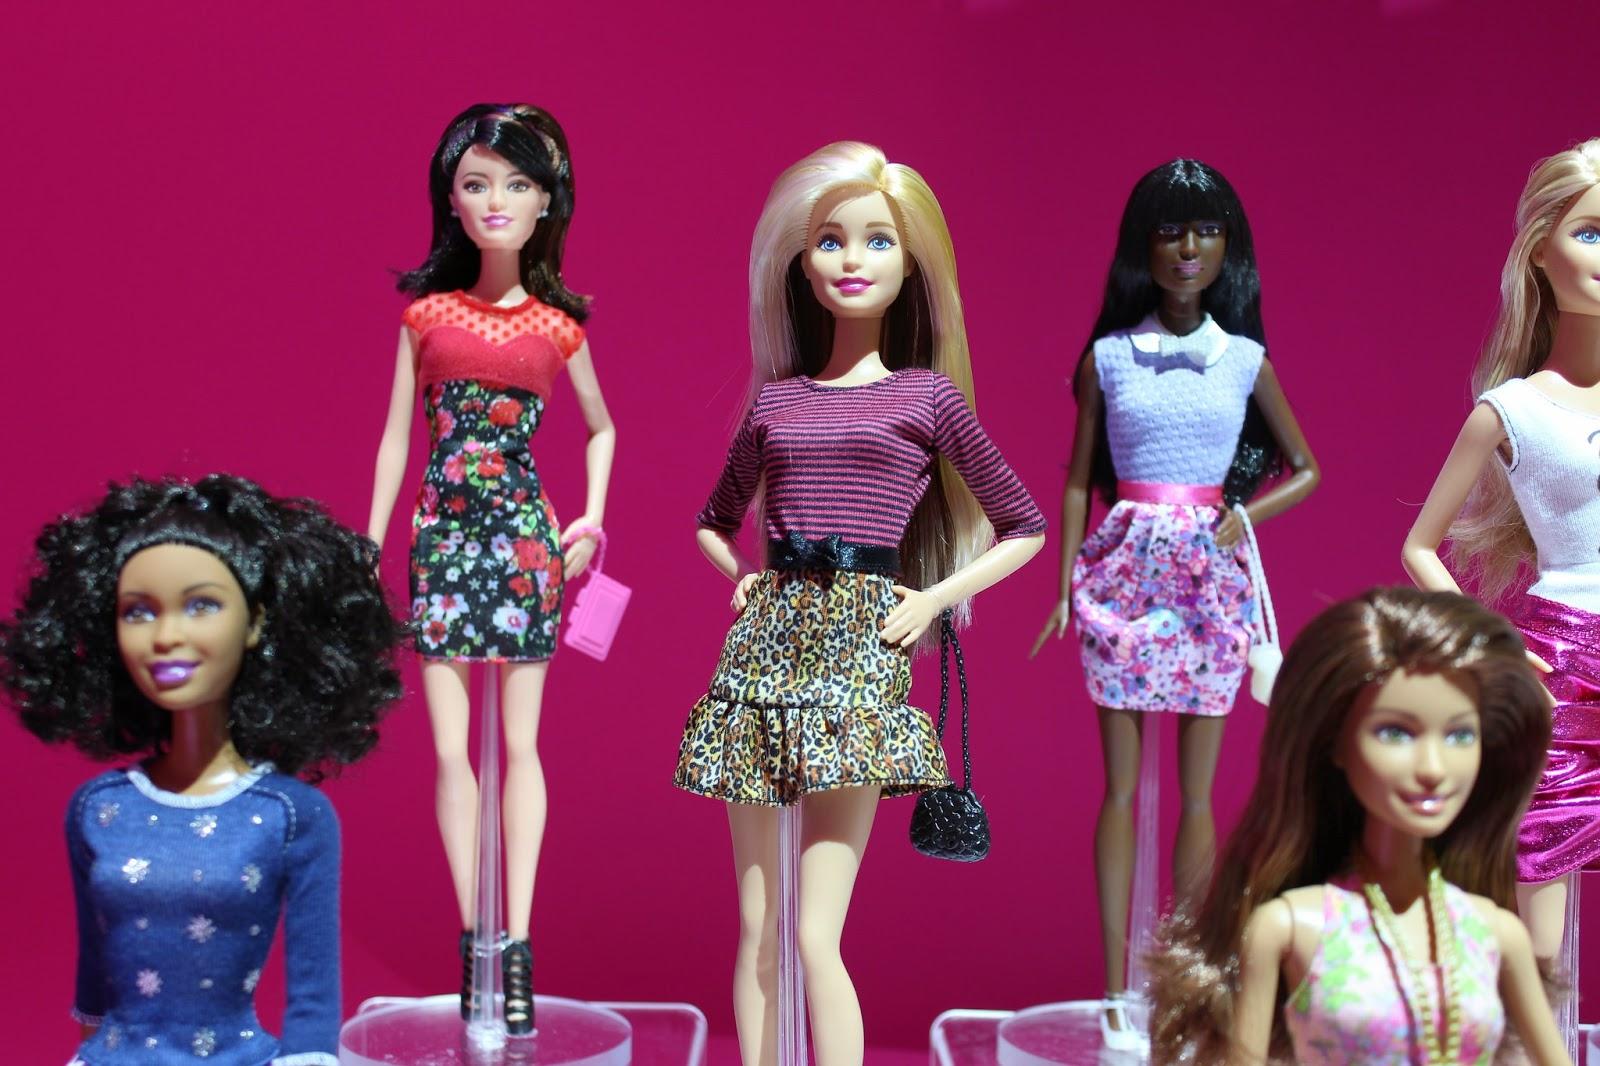 Barbie Fashionistas 2015 Rosa Coleo Barbie Fashionistas